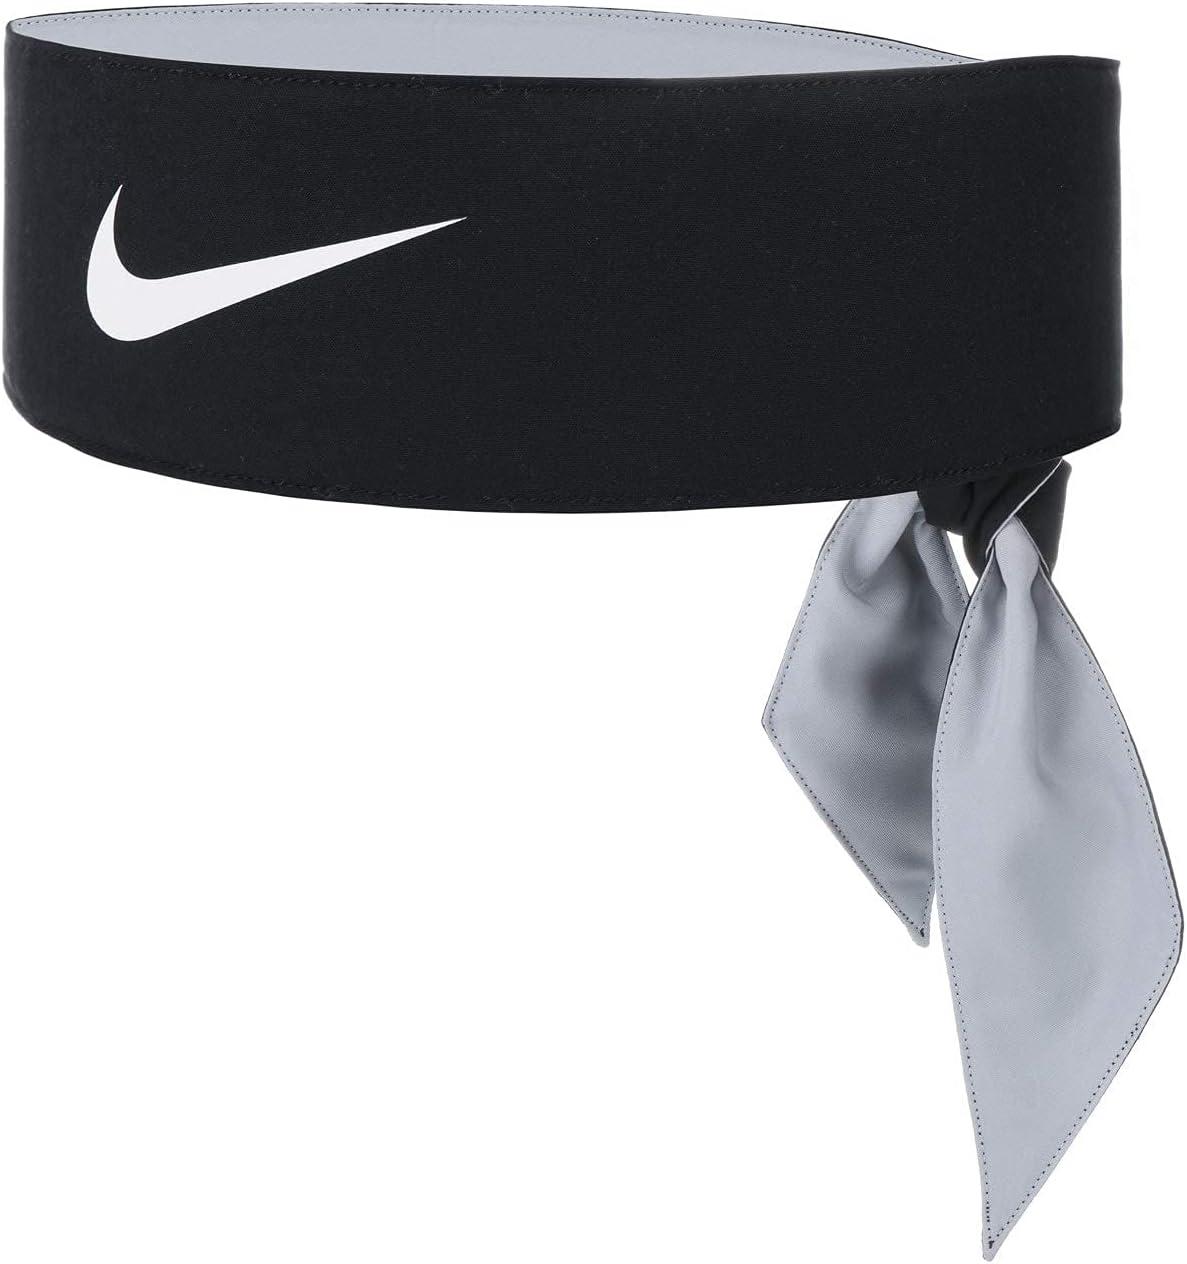 NIKE Tennis Headband Cinta para la Cabeza, Unisex Adulto